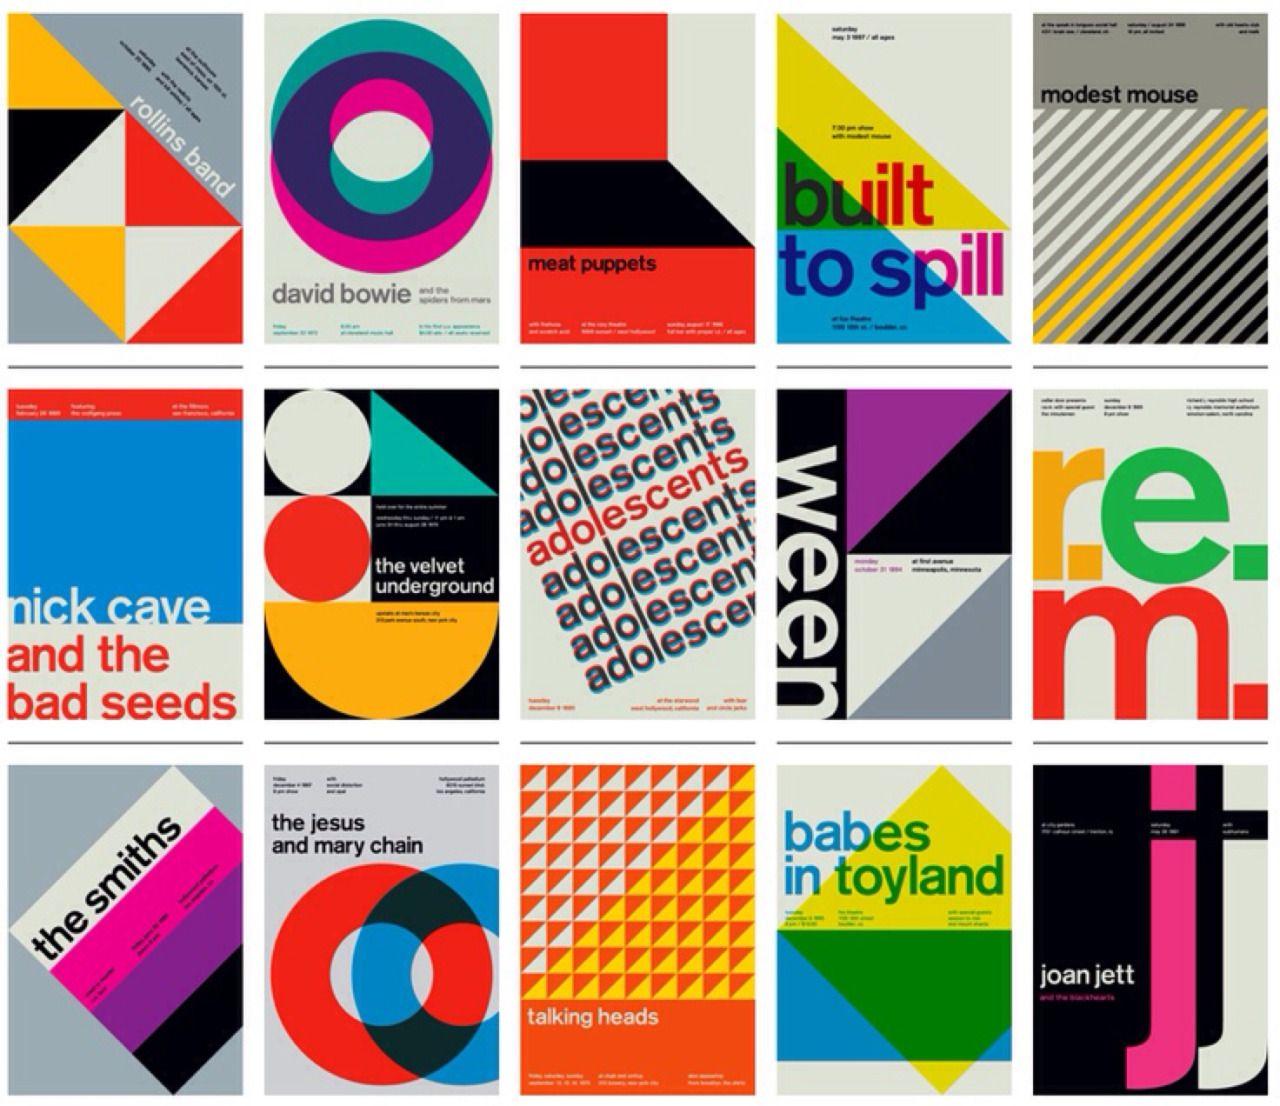 swiss design | tumblr | swiss design, graphic design posters